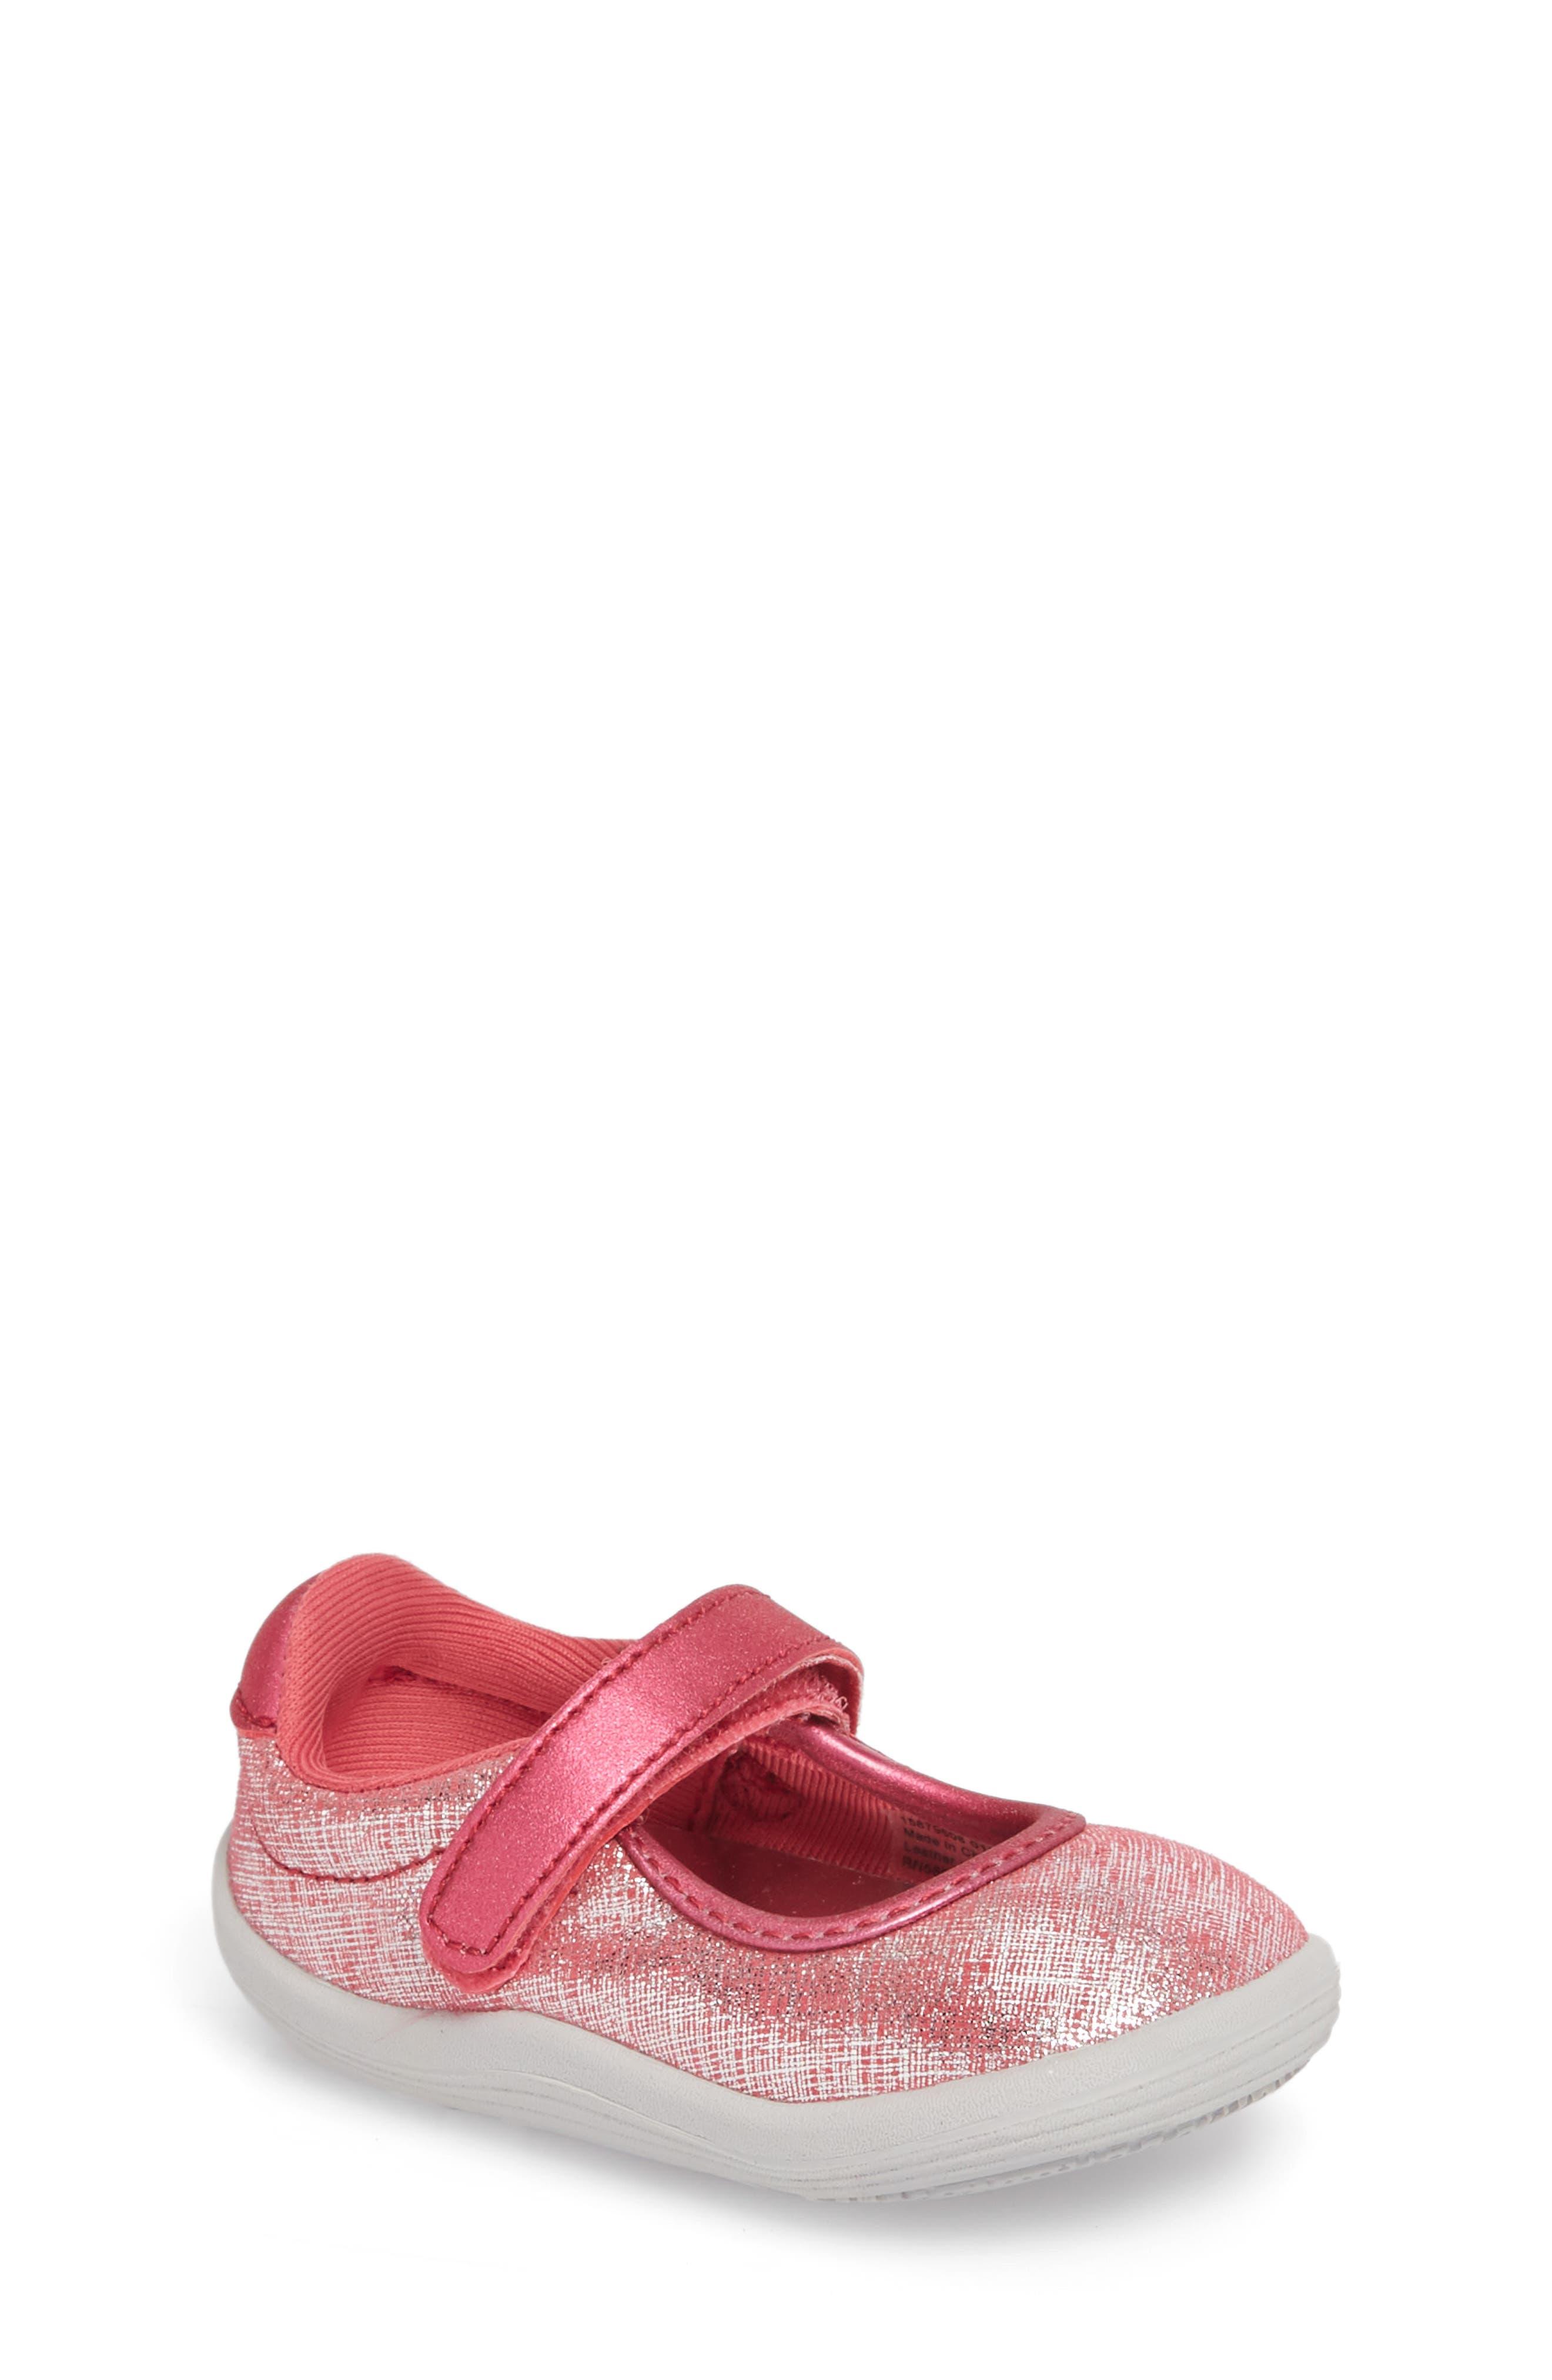 Nora Metallic Mary Jane Sneaker,                         Main,                         color, 650